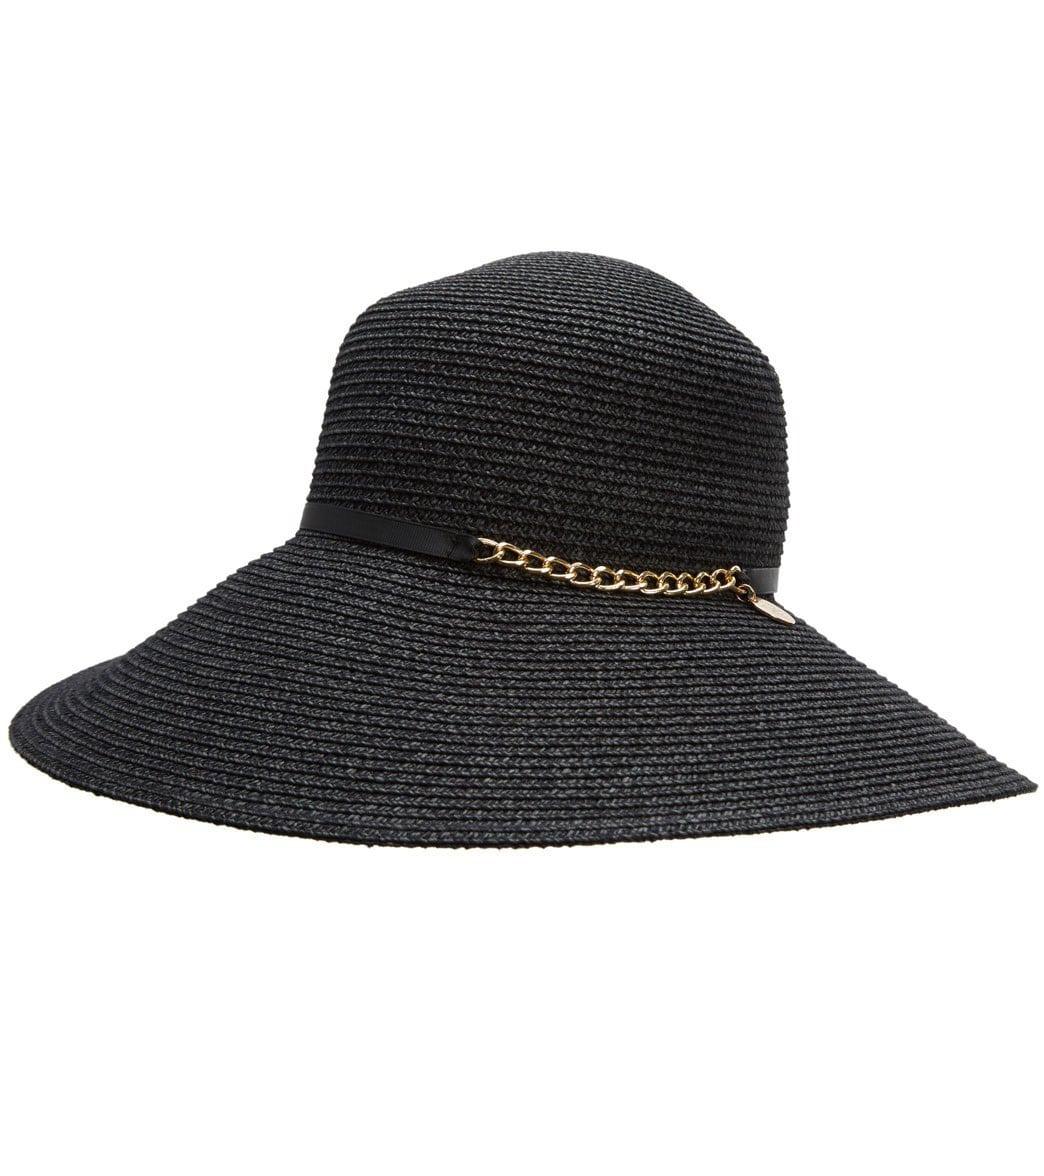 56fbfa76 Physician Endorsed Women's Aria Sun Hat at SwimOutlet.com